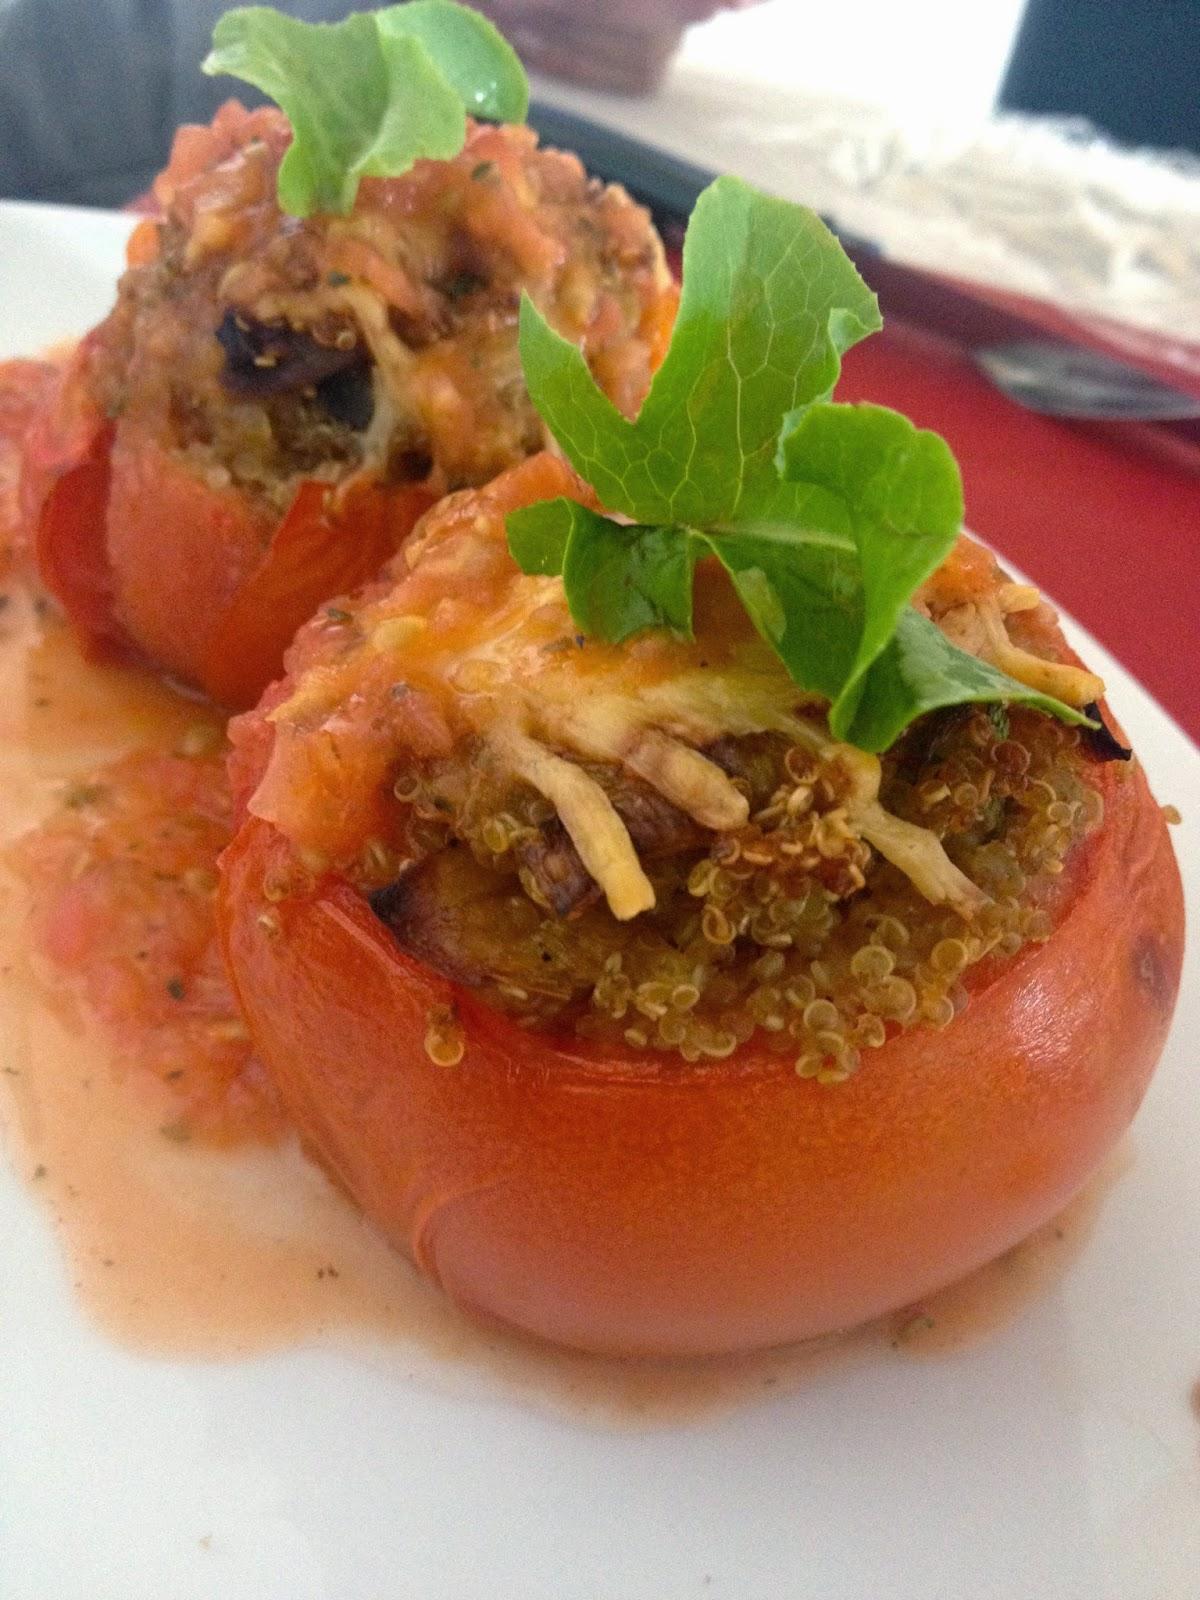 Tomates rellenos de quinoa y verduras